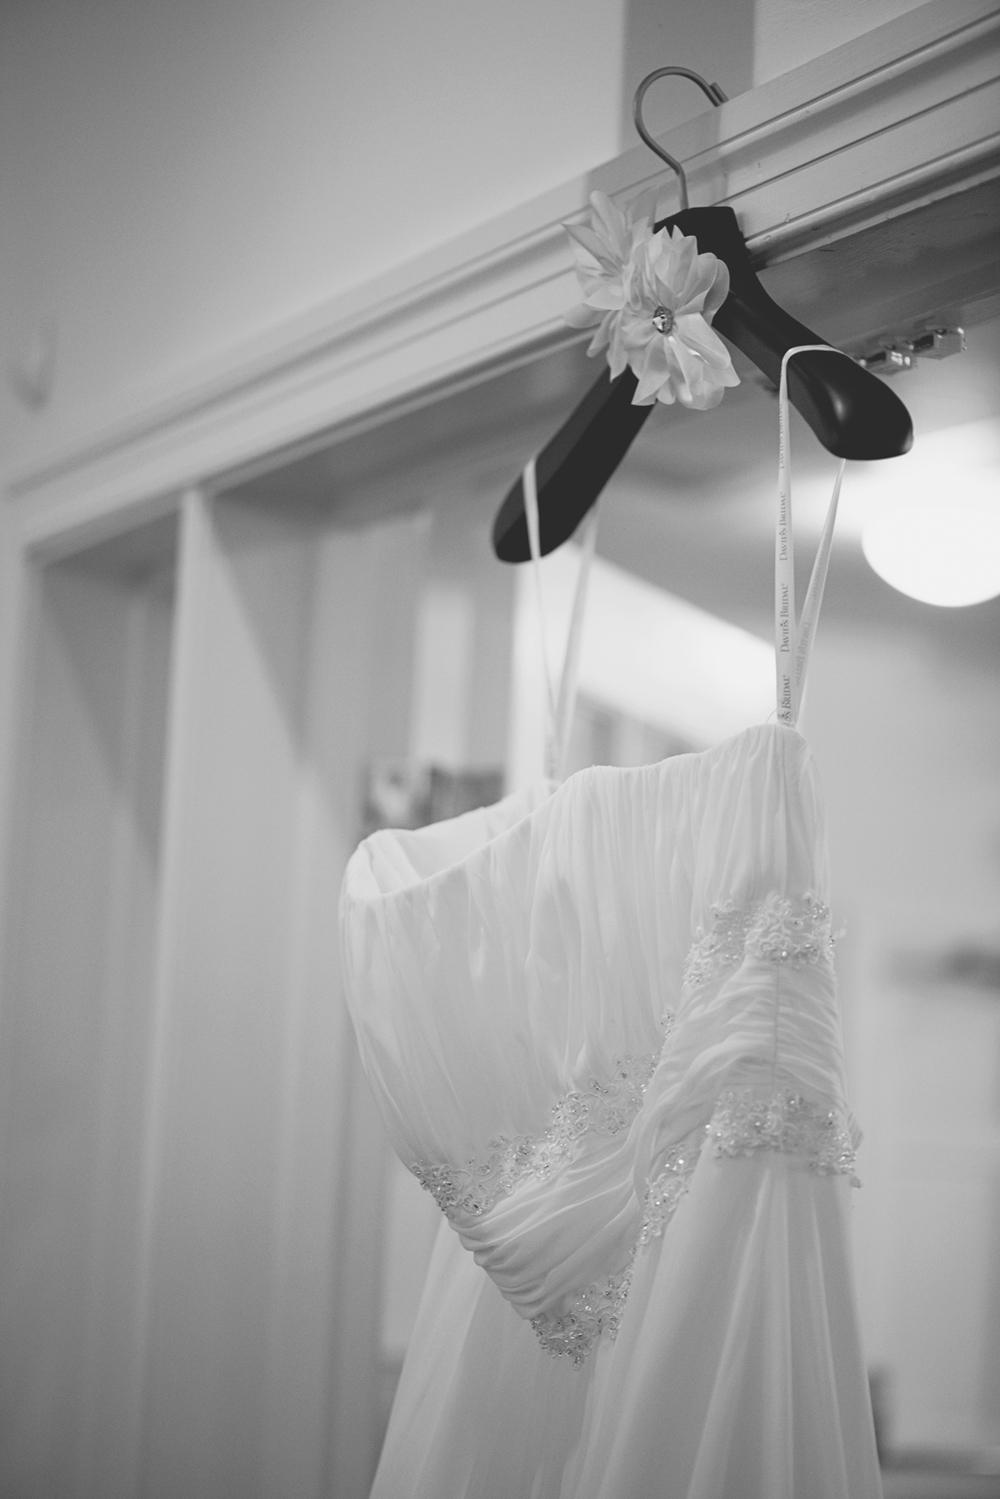 Wedding dress details with handmade hanger(David's Bridal) (black and white)